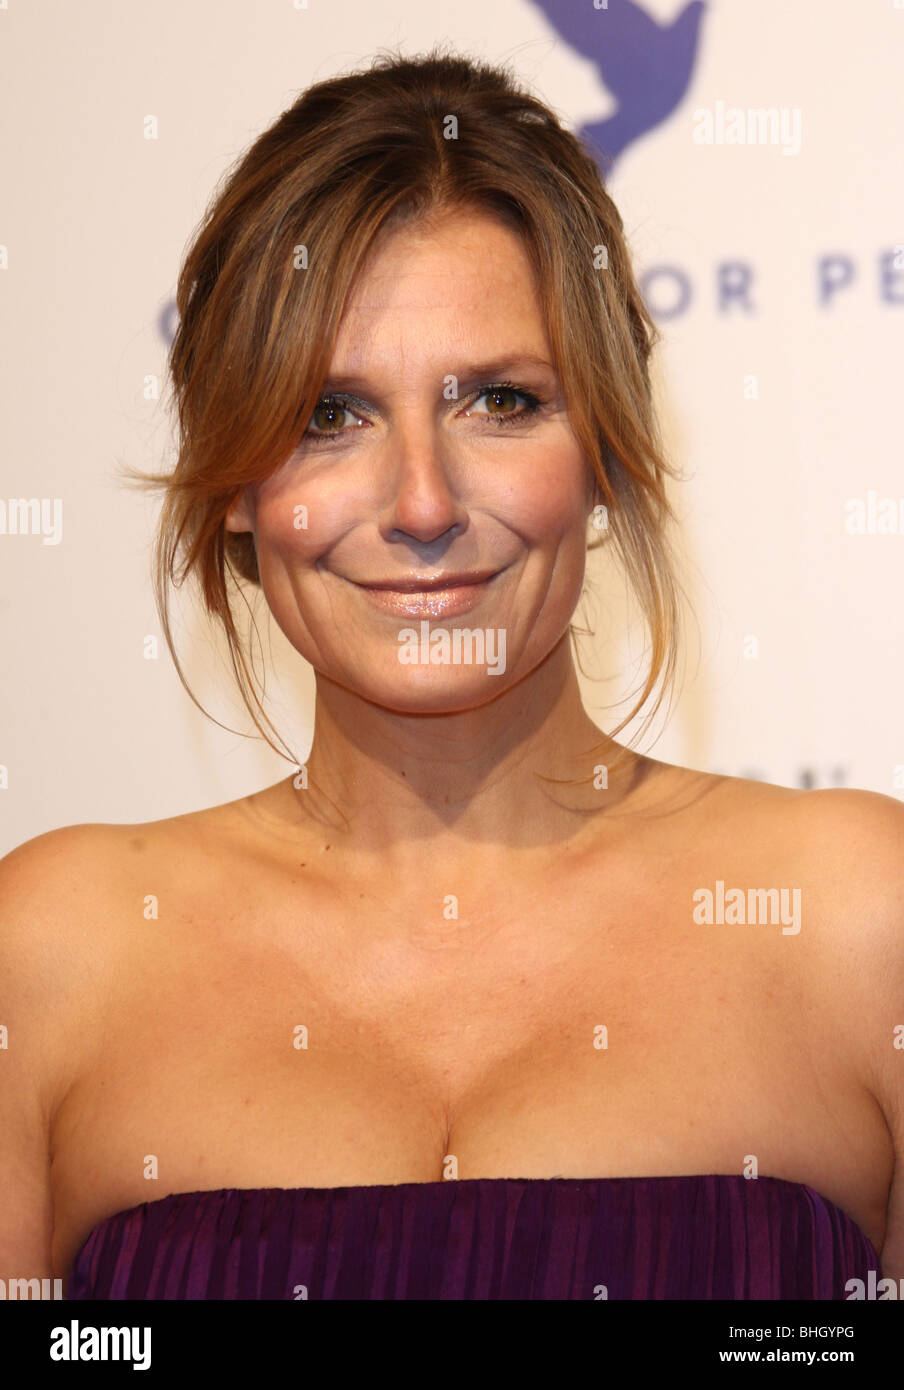 Katharina schubert nackt images 57